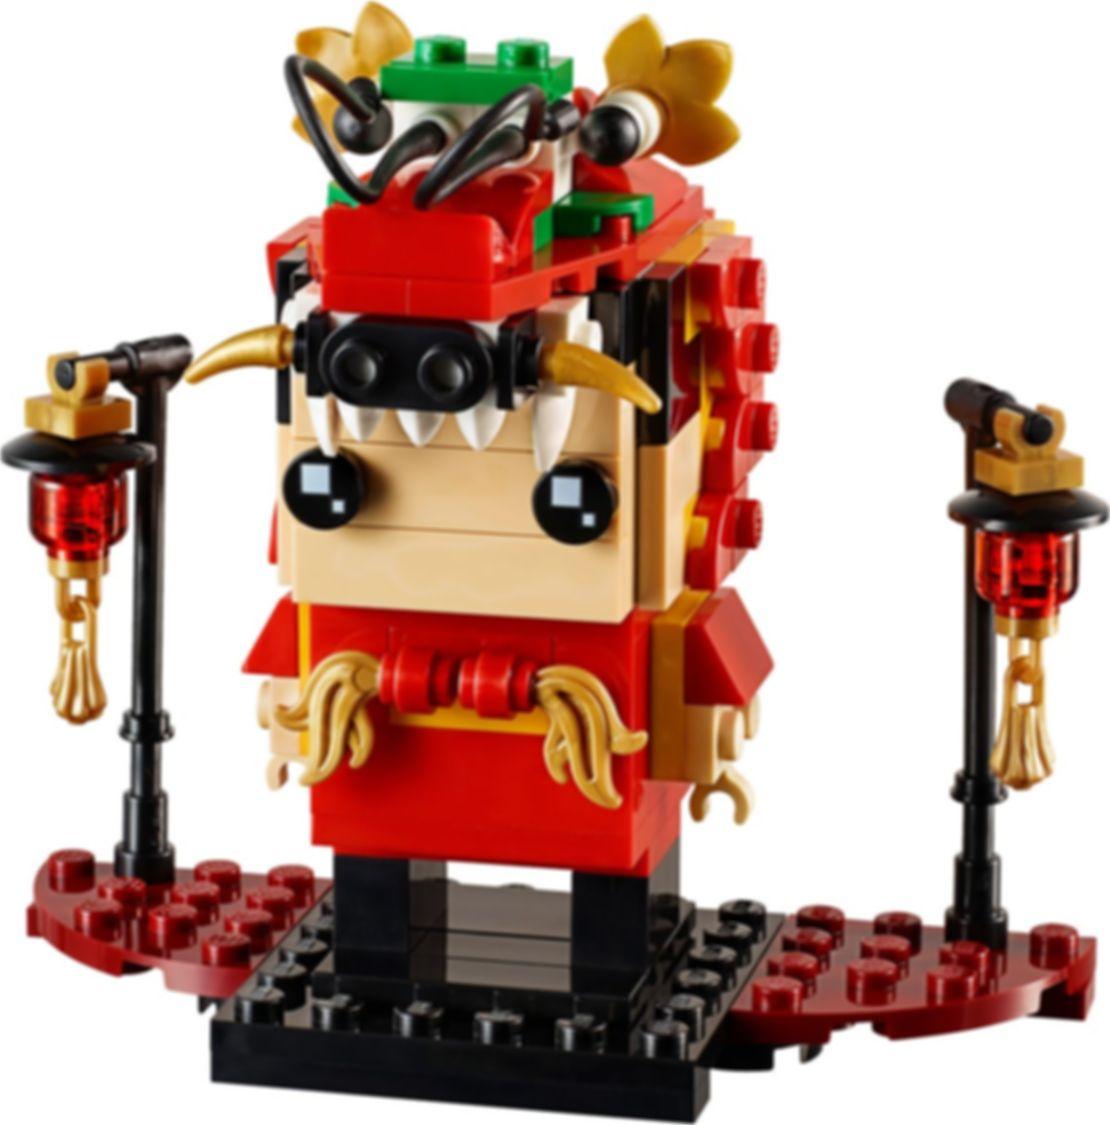 Dragon Dance Guy components